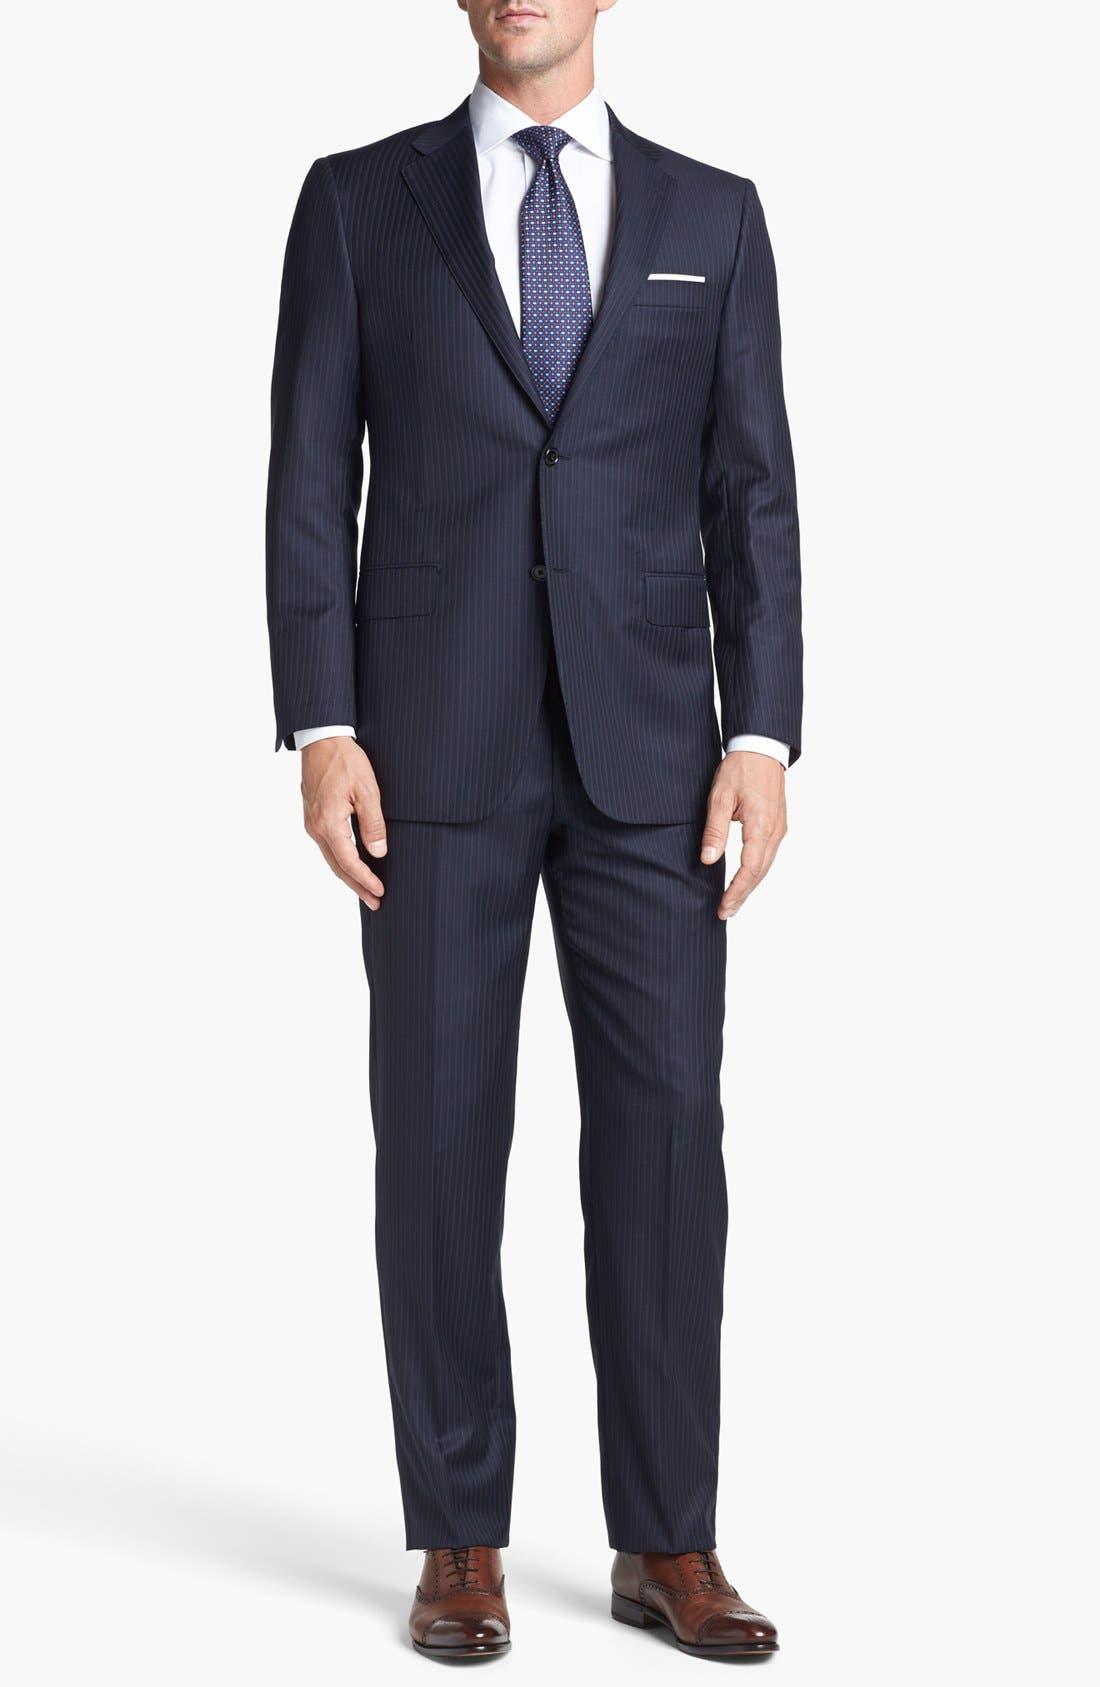 Main Image - Hickey Freeman 'B Series' Classic Fit Stripe Suit